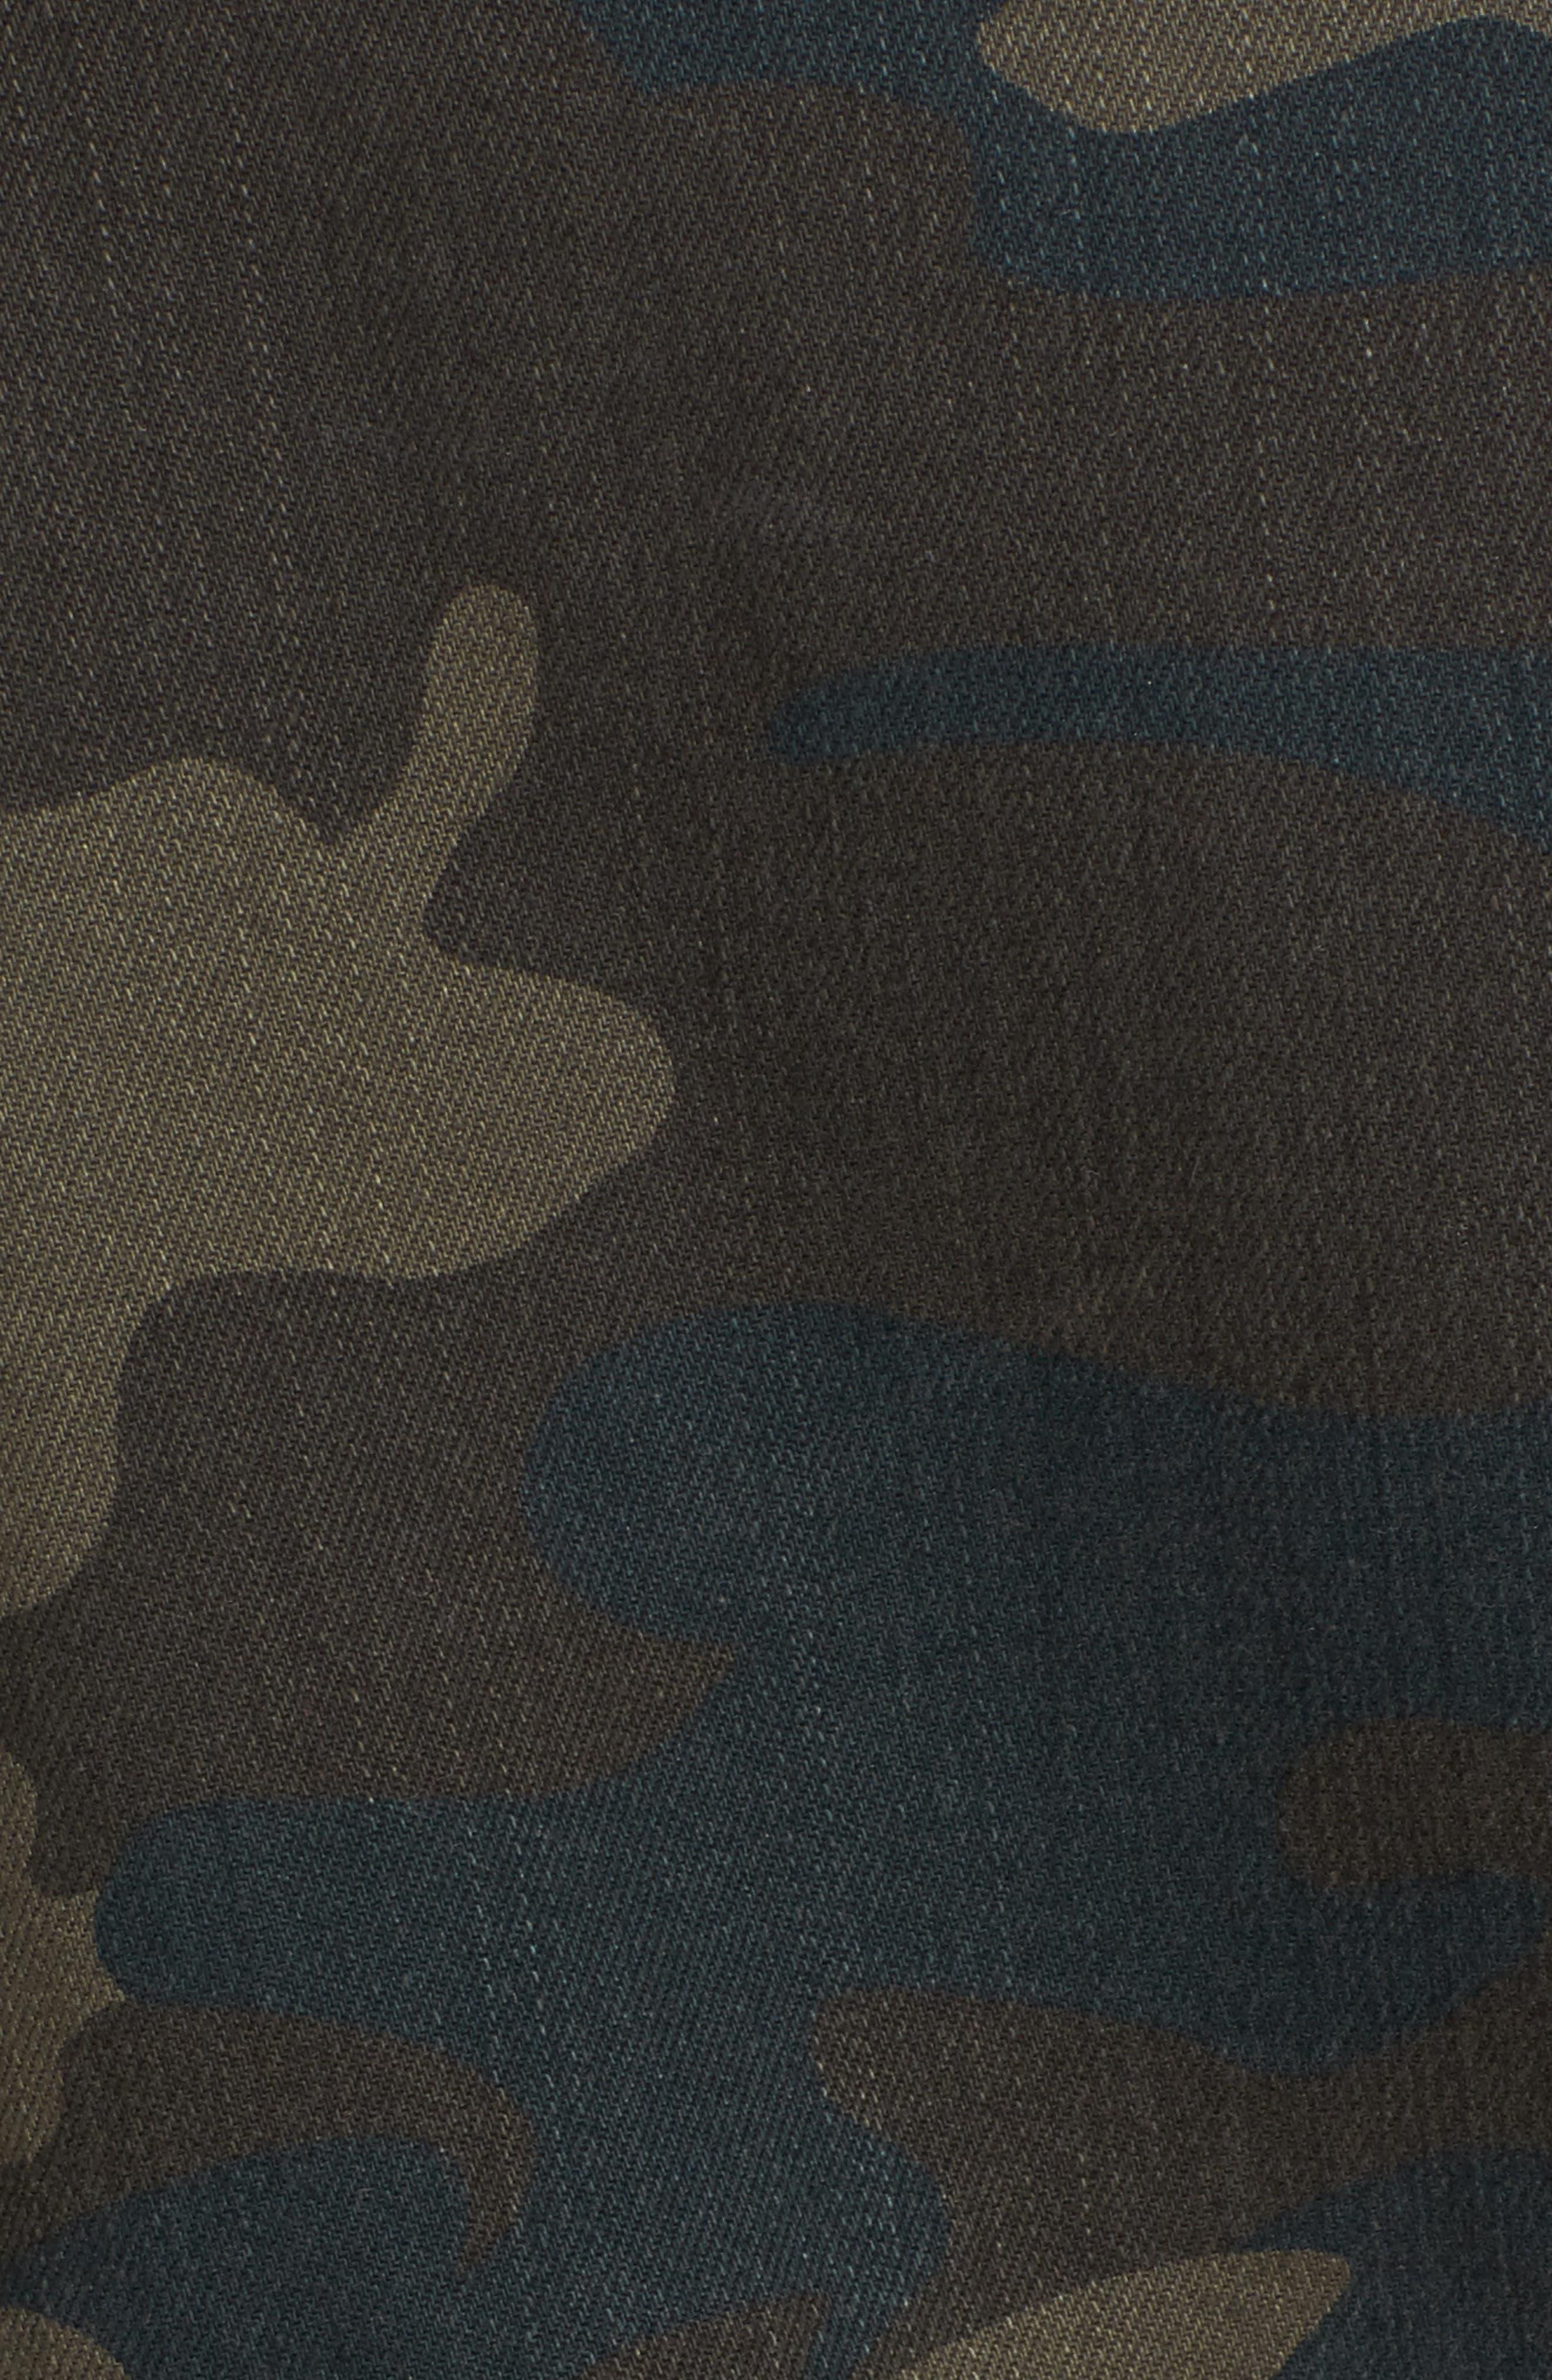 Studded Leopard Print Moto Jacket,                             Alternate thumbnail 5, color,                             Camo